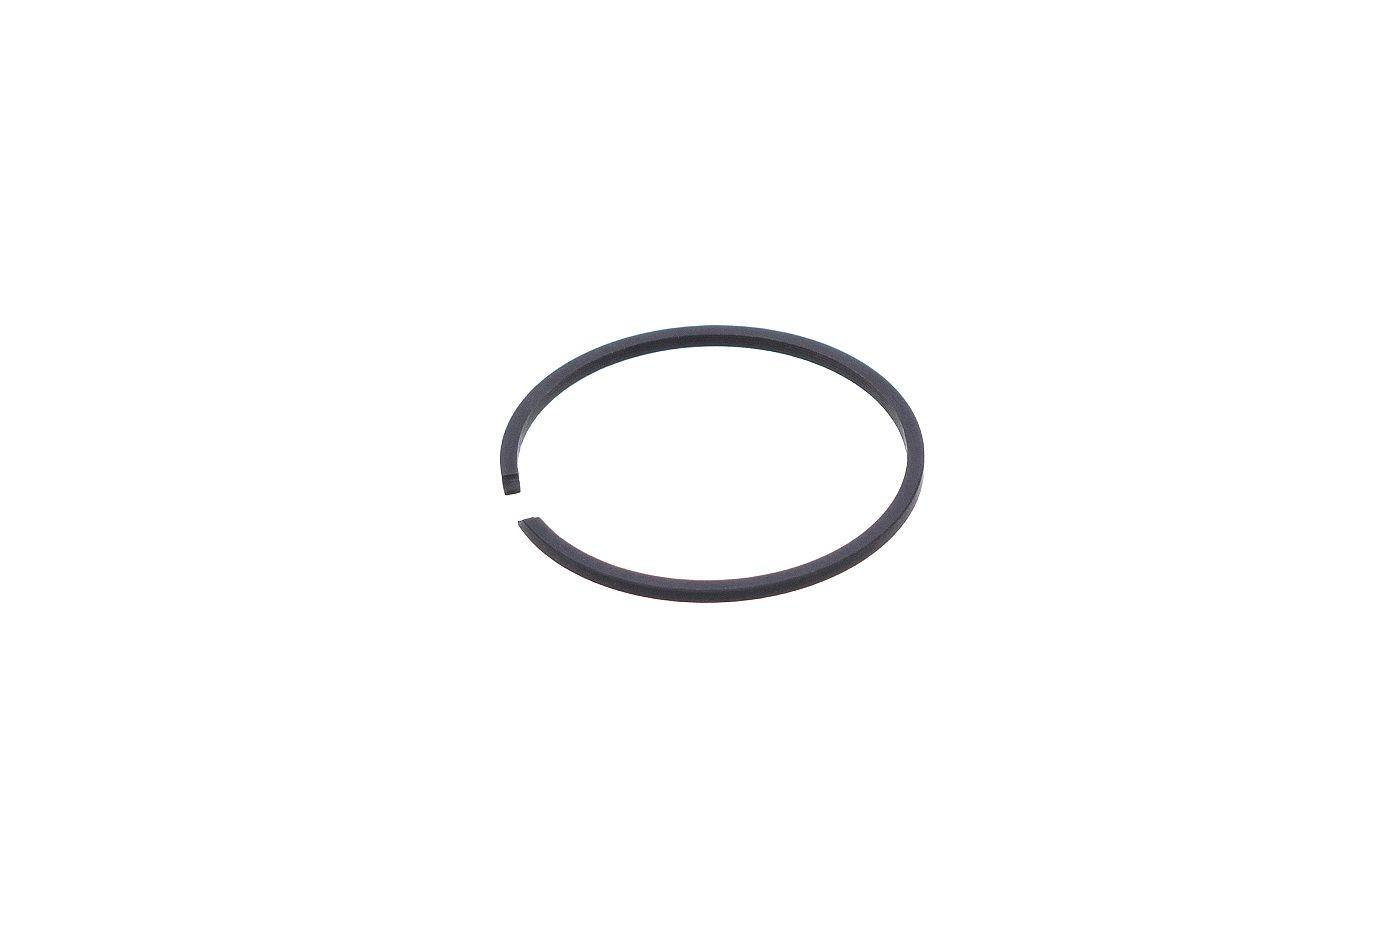 Piestny krúžok 35 x 1,5 mm